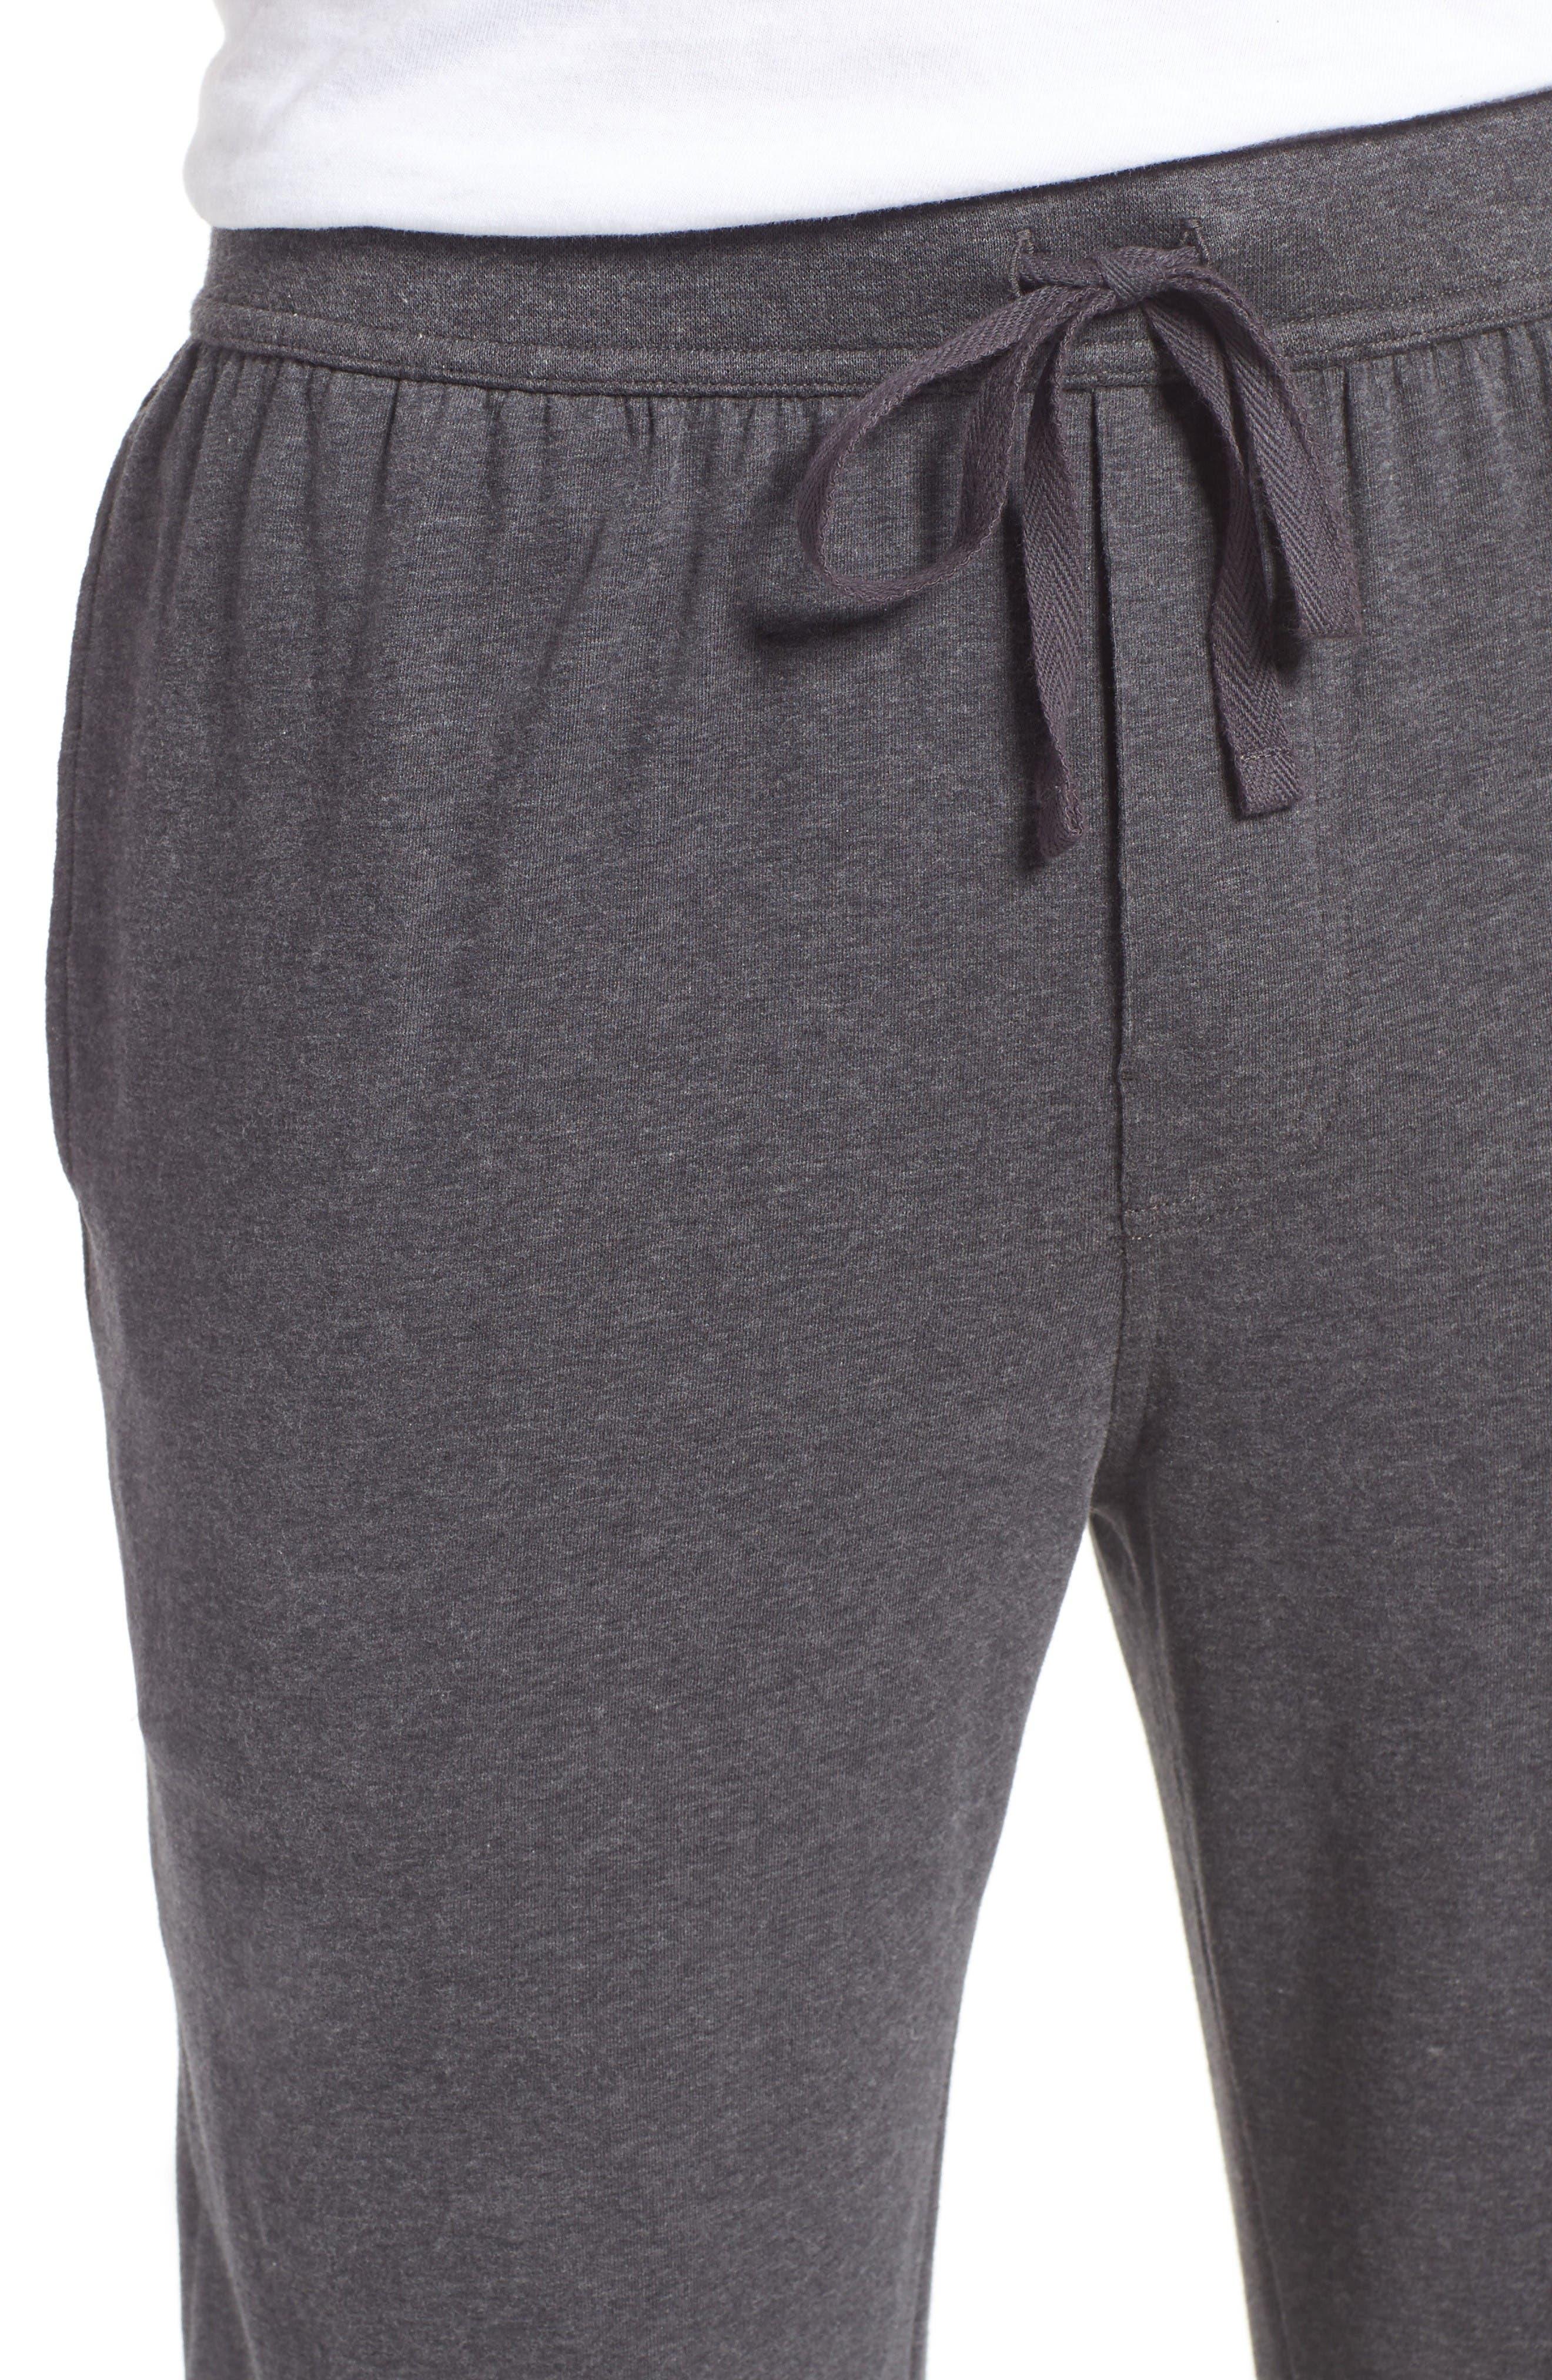 Stretch Cotton Lounge Pants,                             Alternate thumbnail 4, color,                             Grey Charcoal